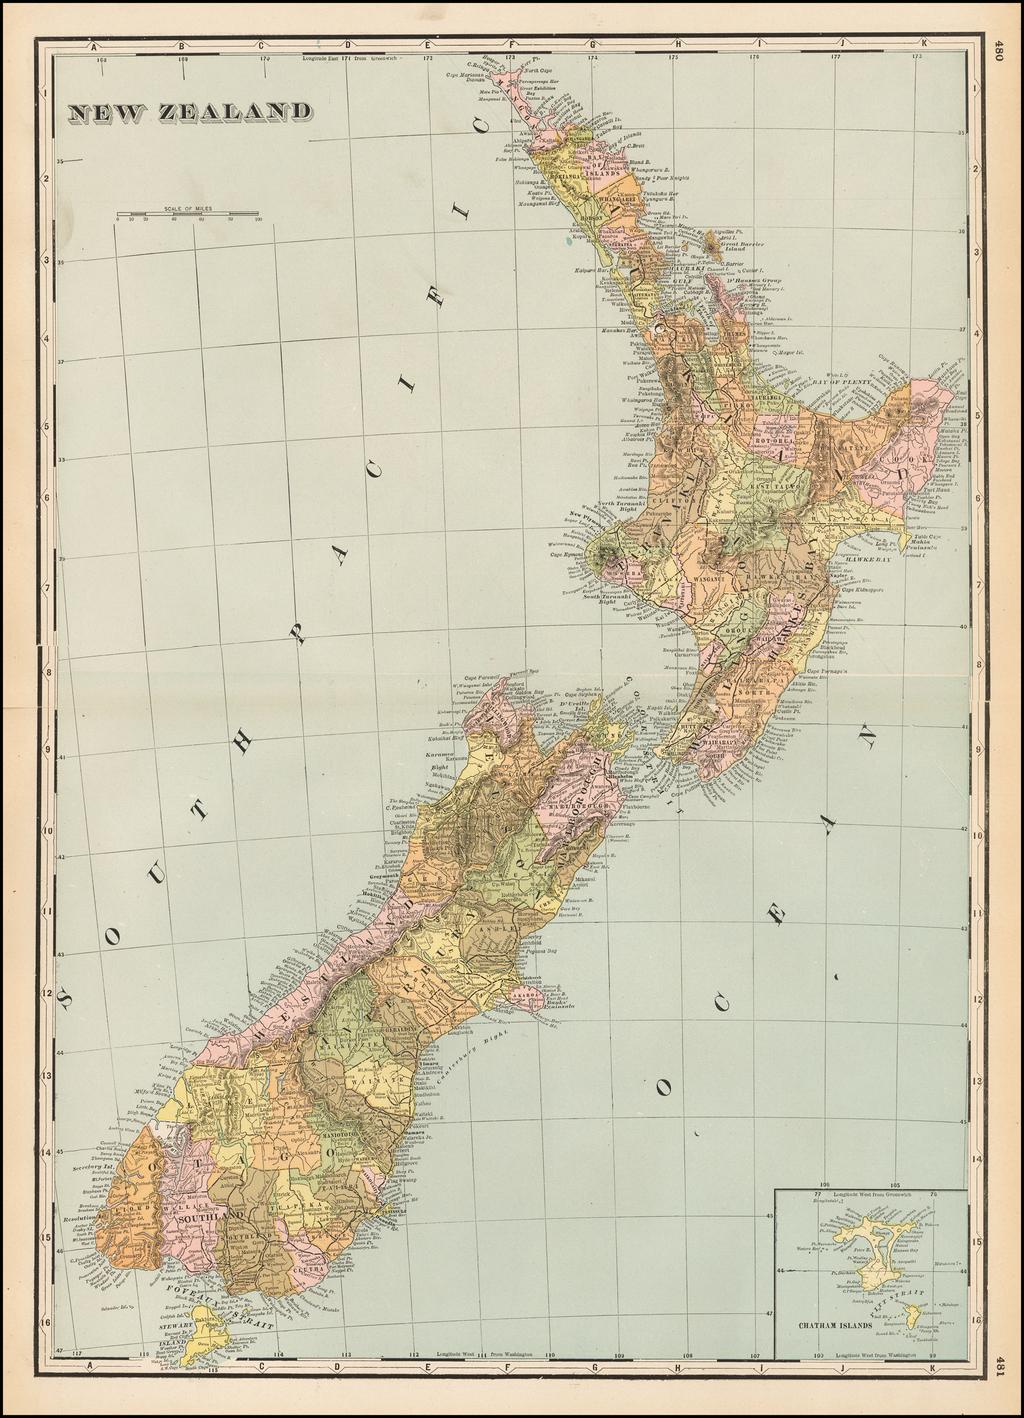 New Zealand By George F. Cram